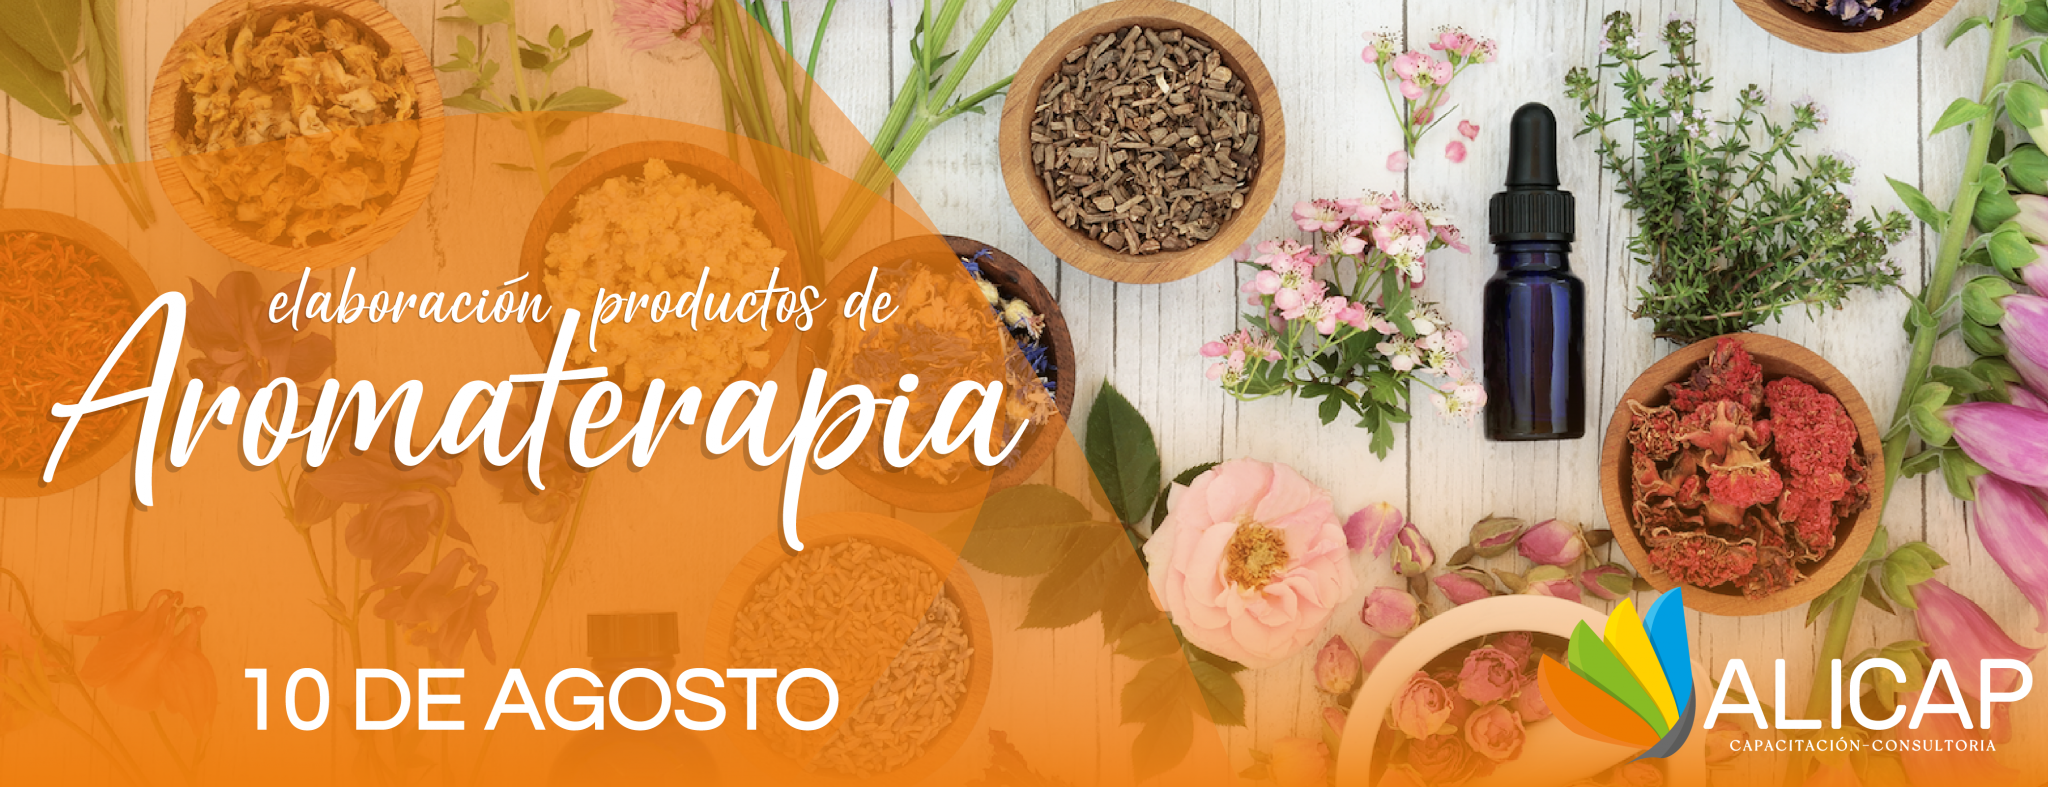 Aromaterapia banner